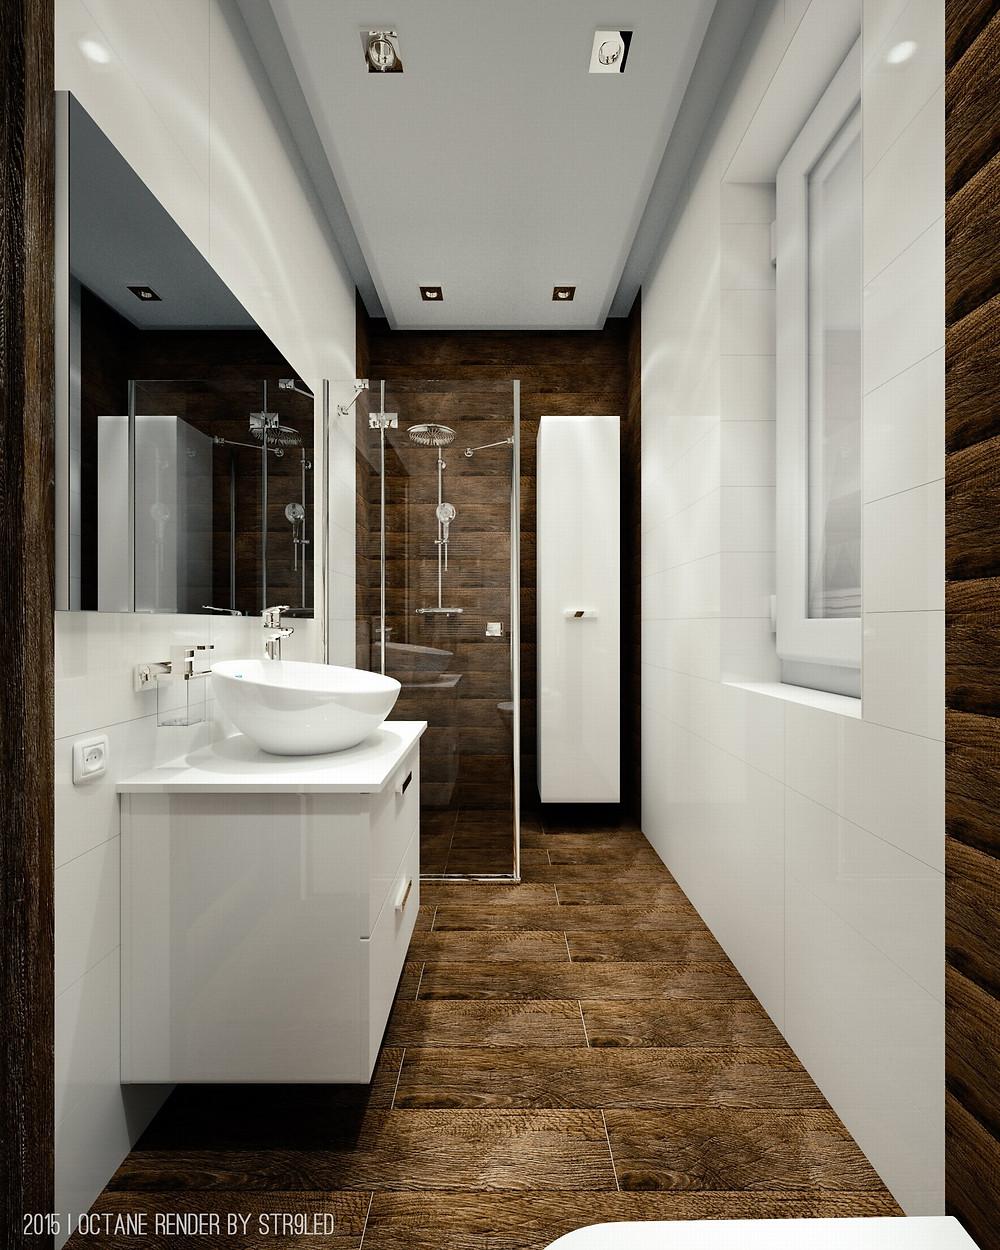 Render arquitectonico interior realista